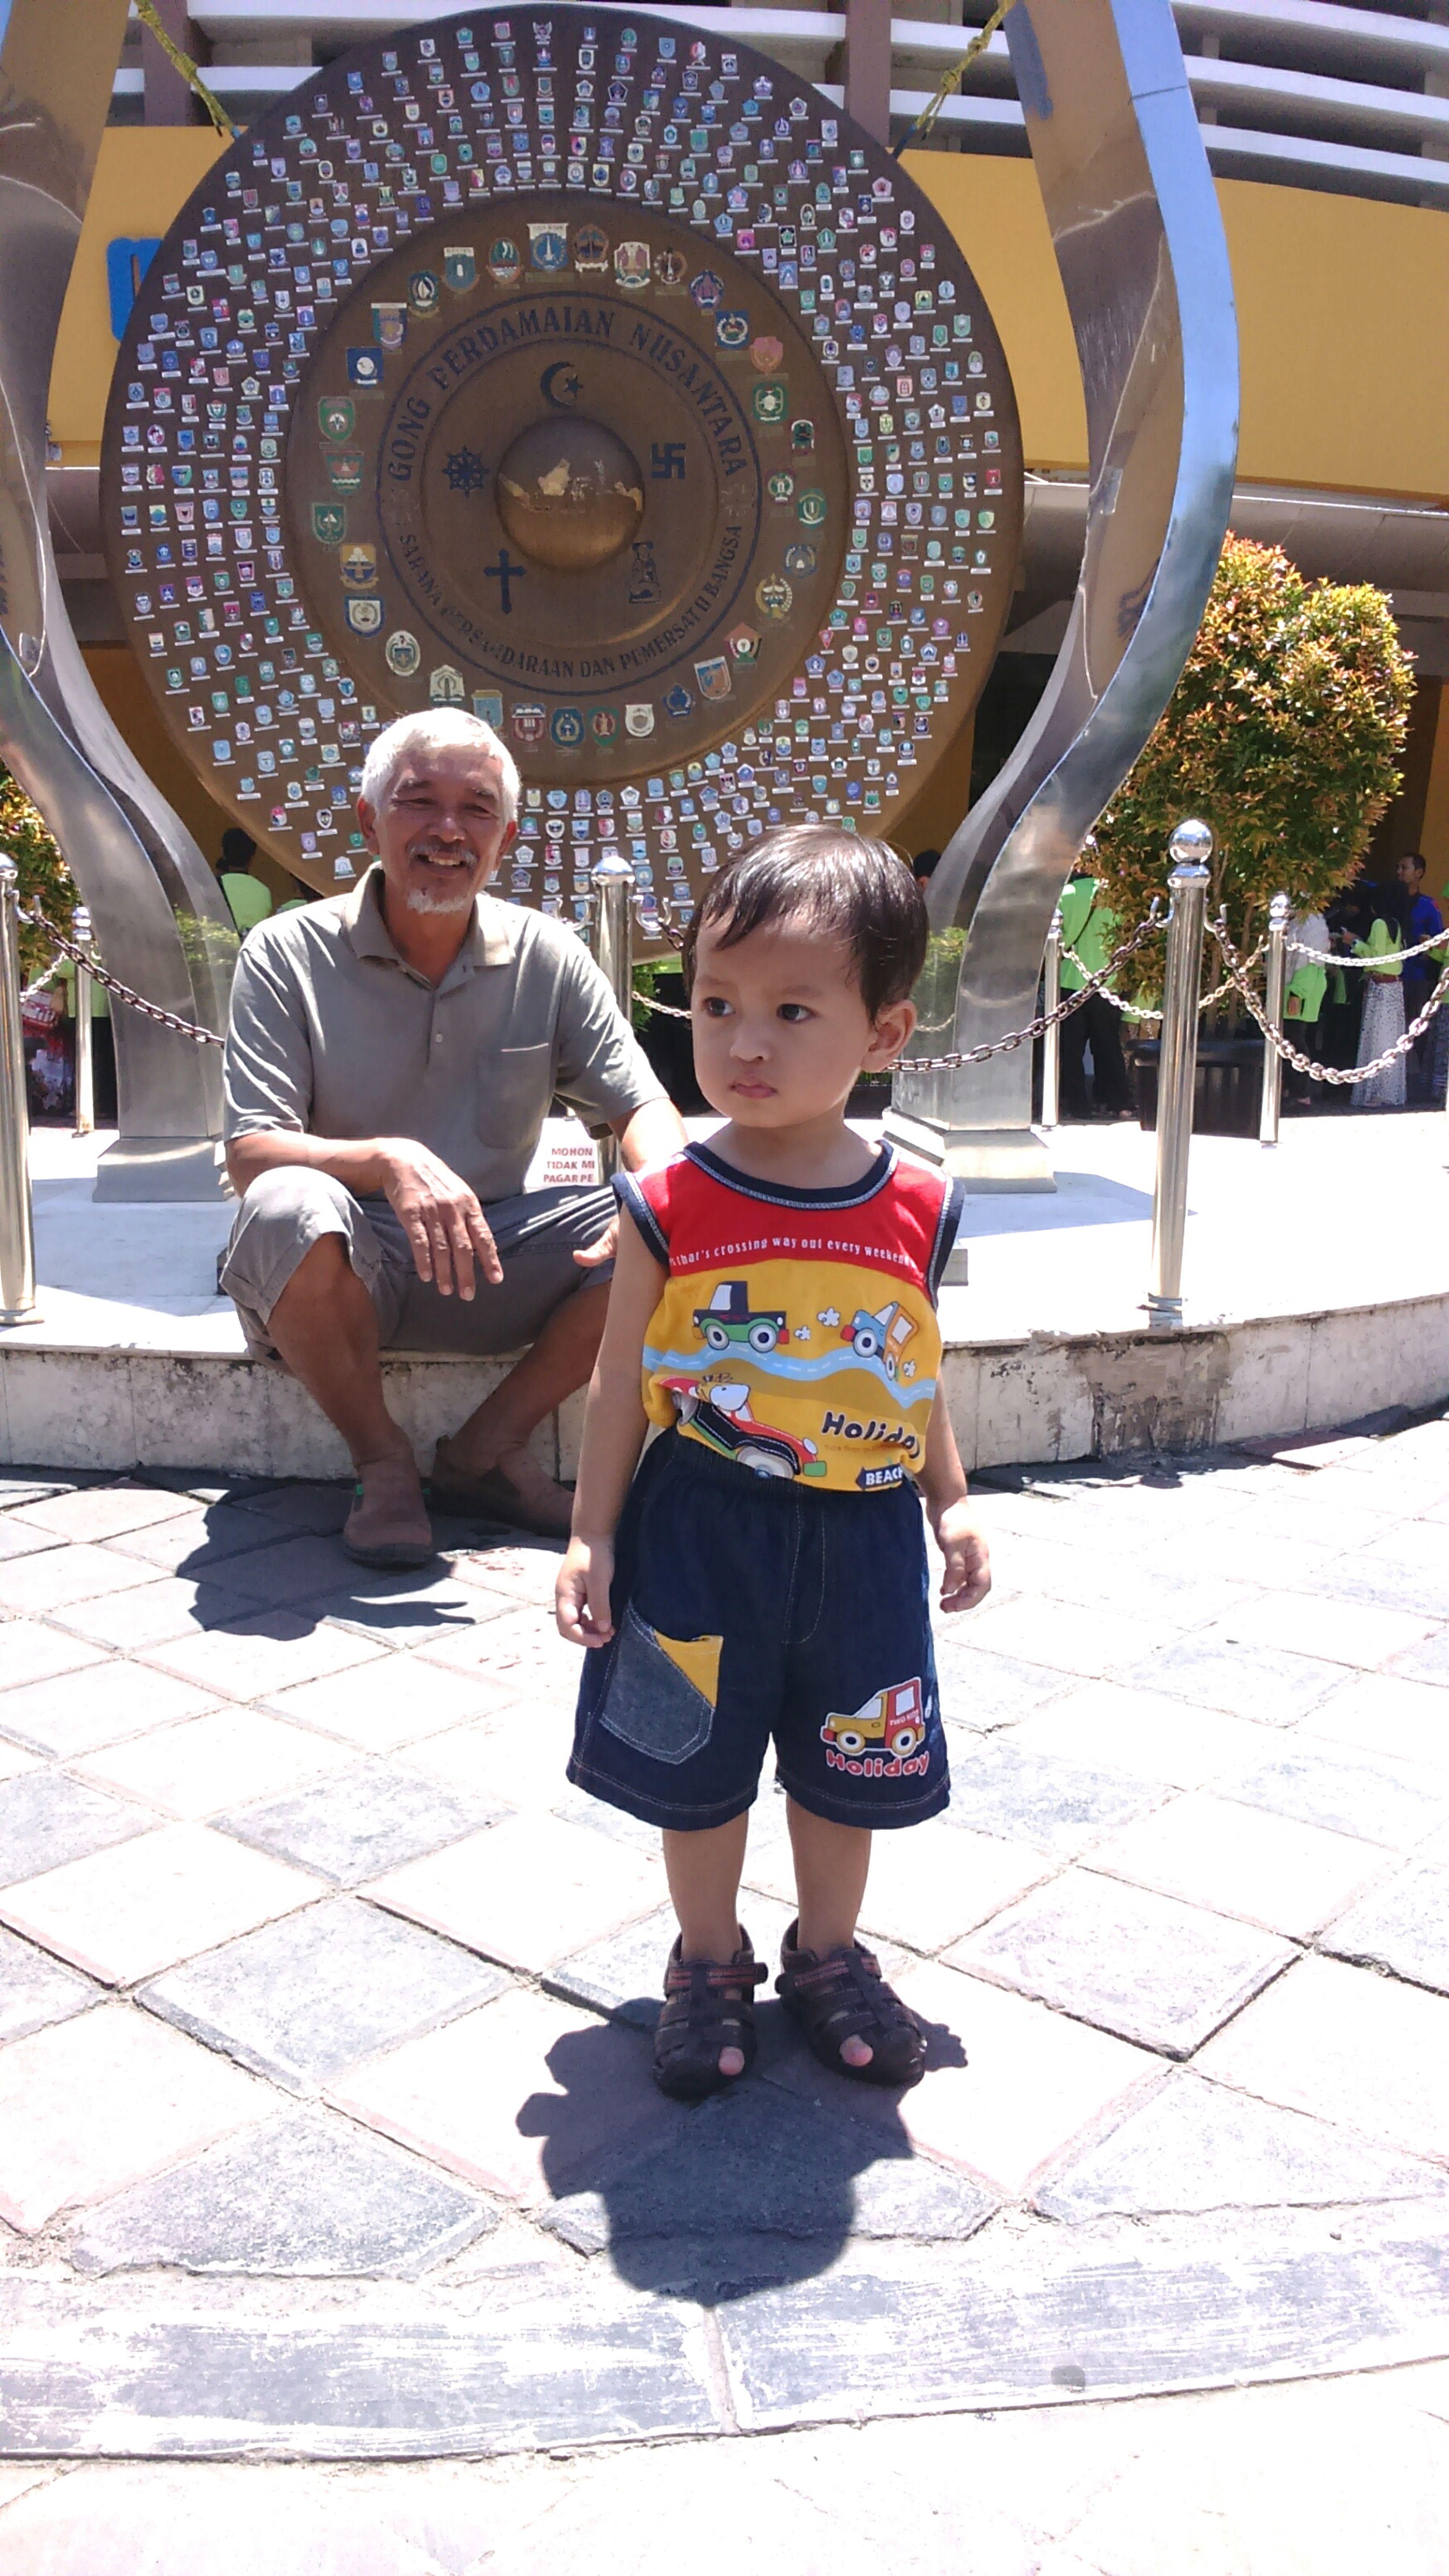 Spend time with grandfather Enjoying Life Family Kids Learn & Shoot: Layering Summer Views Traveling Enjoying The Sun EMCSummerViews